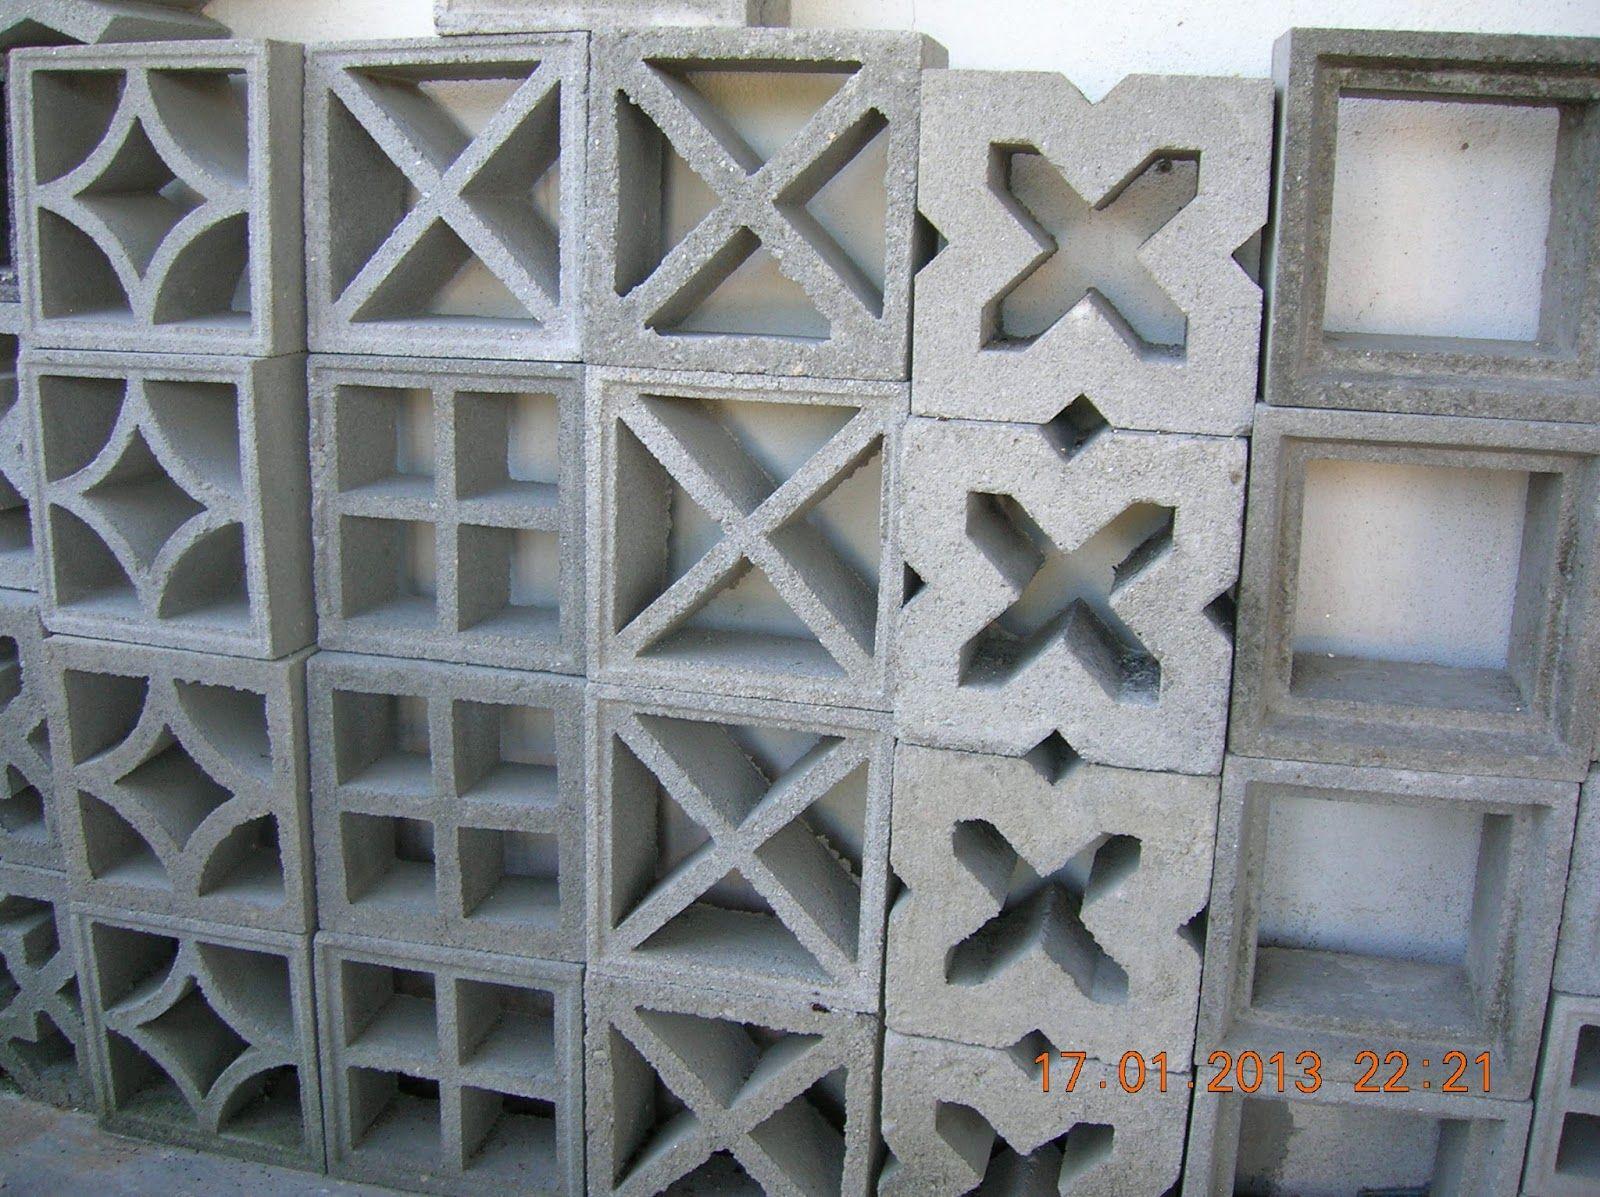 Ventilation Block Supplier Malaysia C Amp G United Trading Breeze Blocks Breeze Block Wall Screen Block